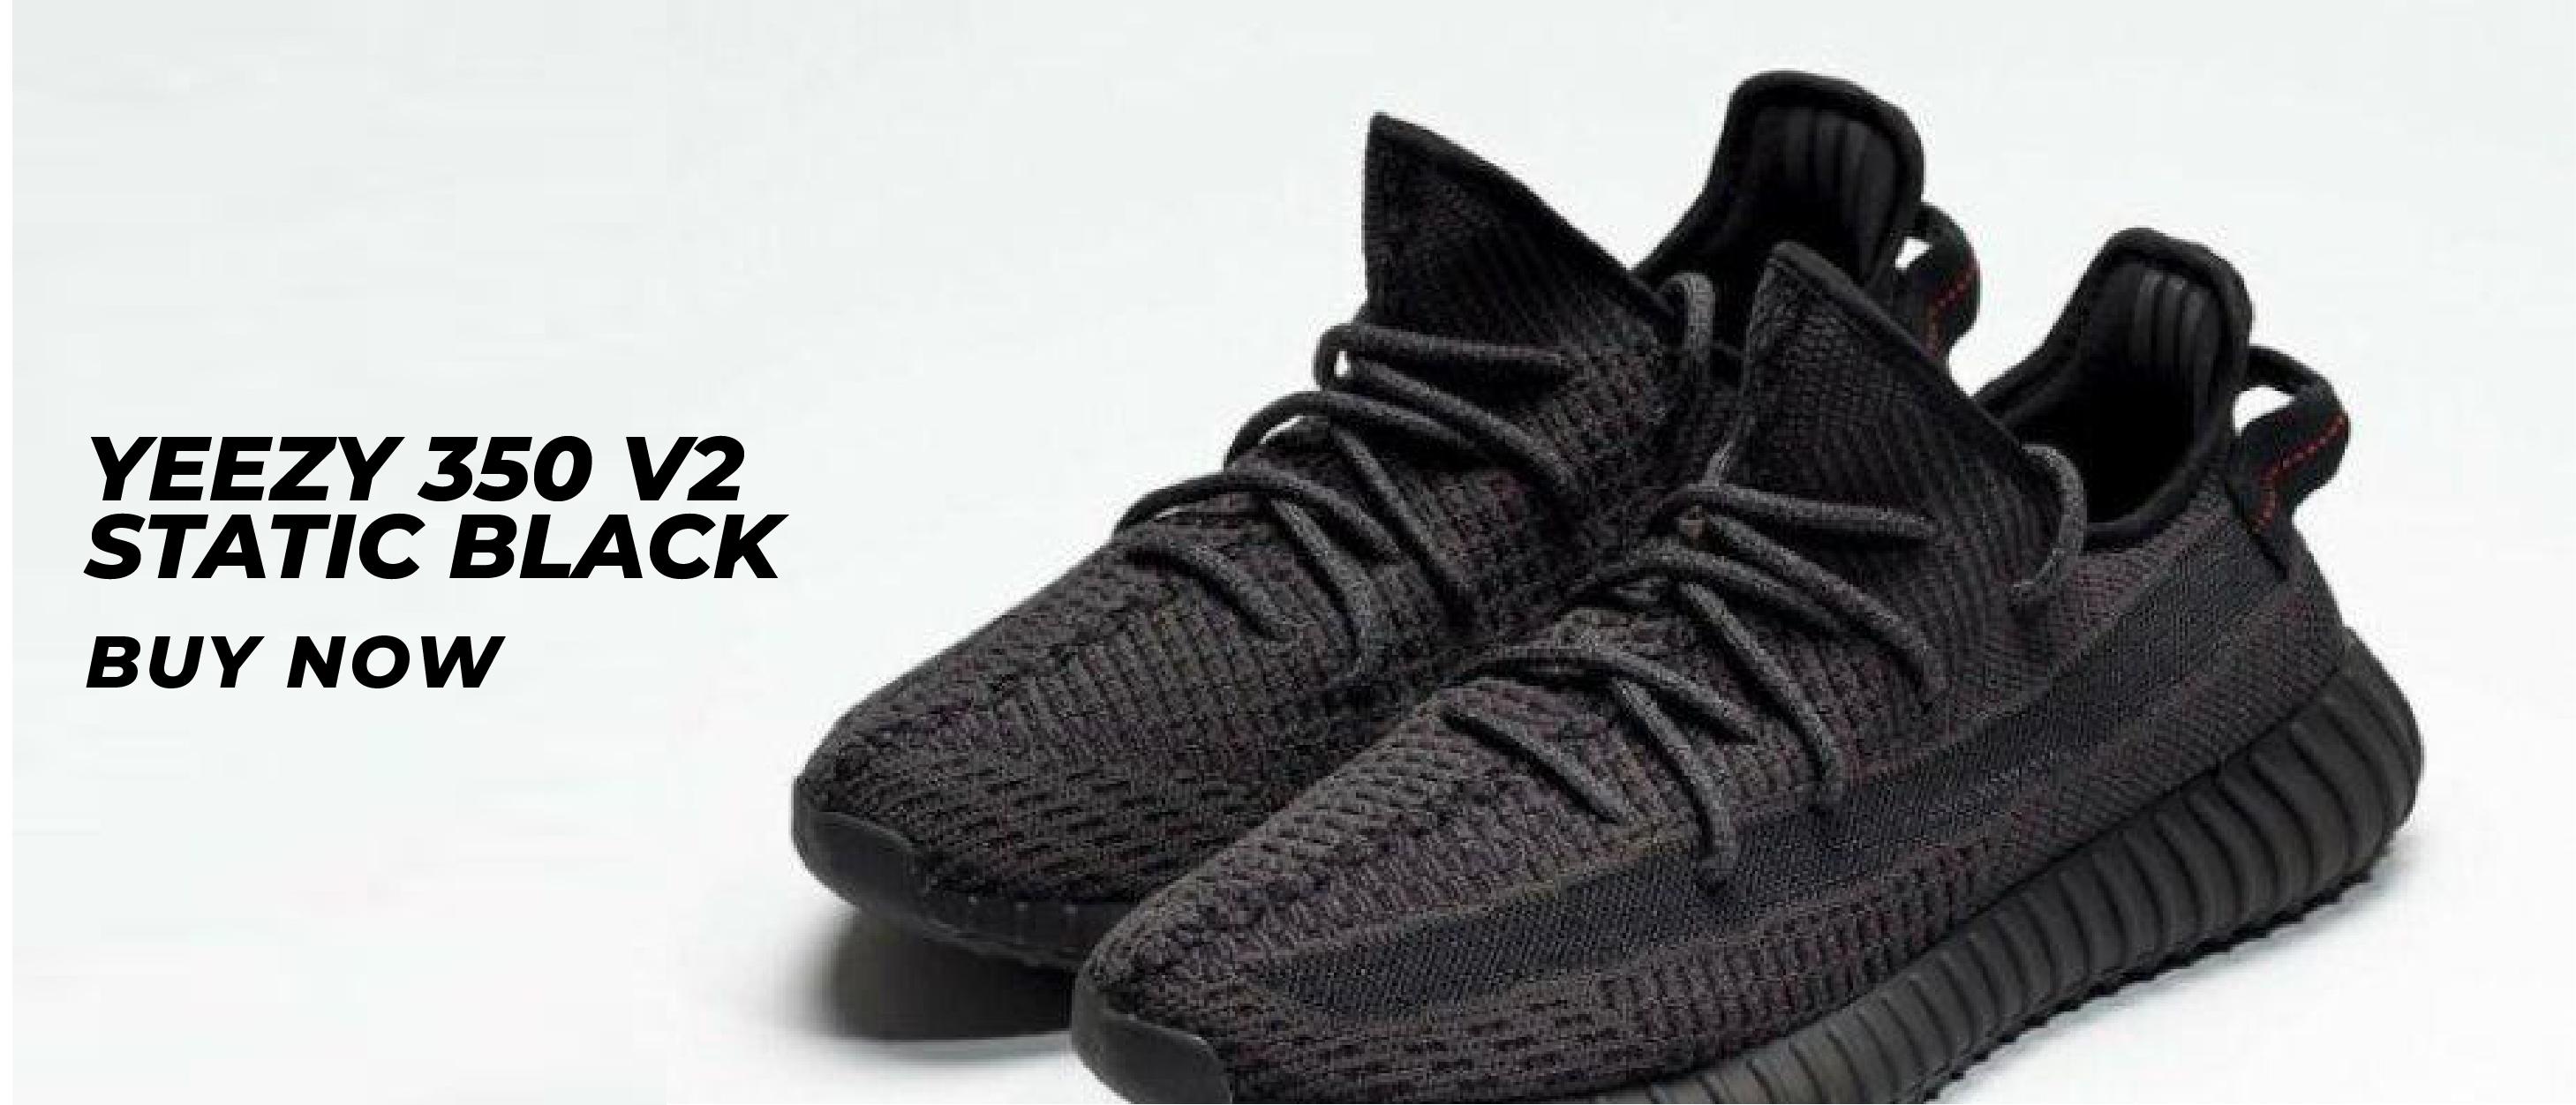 separation shoes 47212 9a9b1 YEEZY 350 V2 BLACK